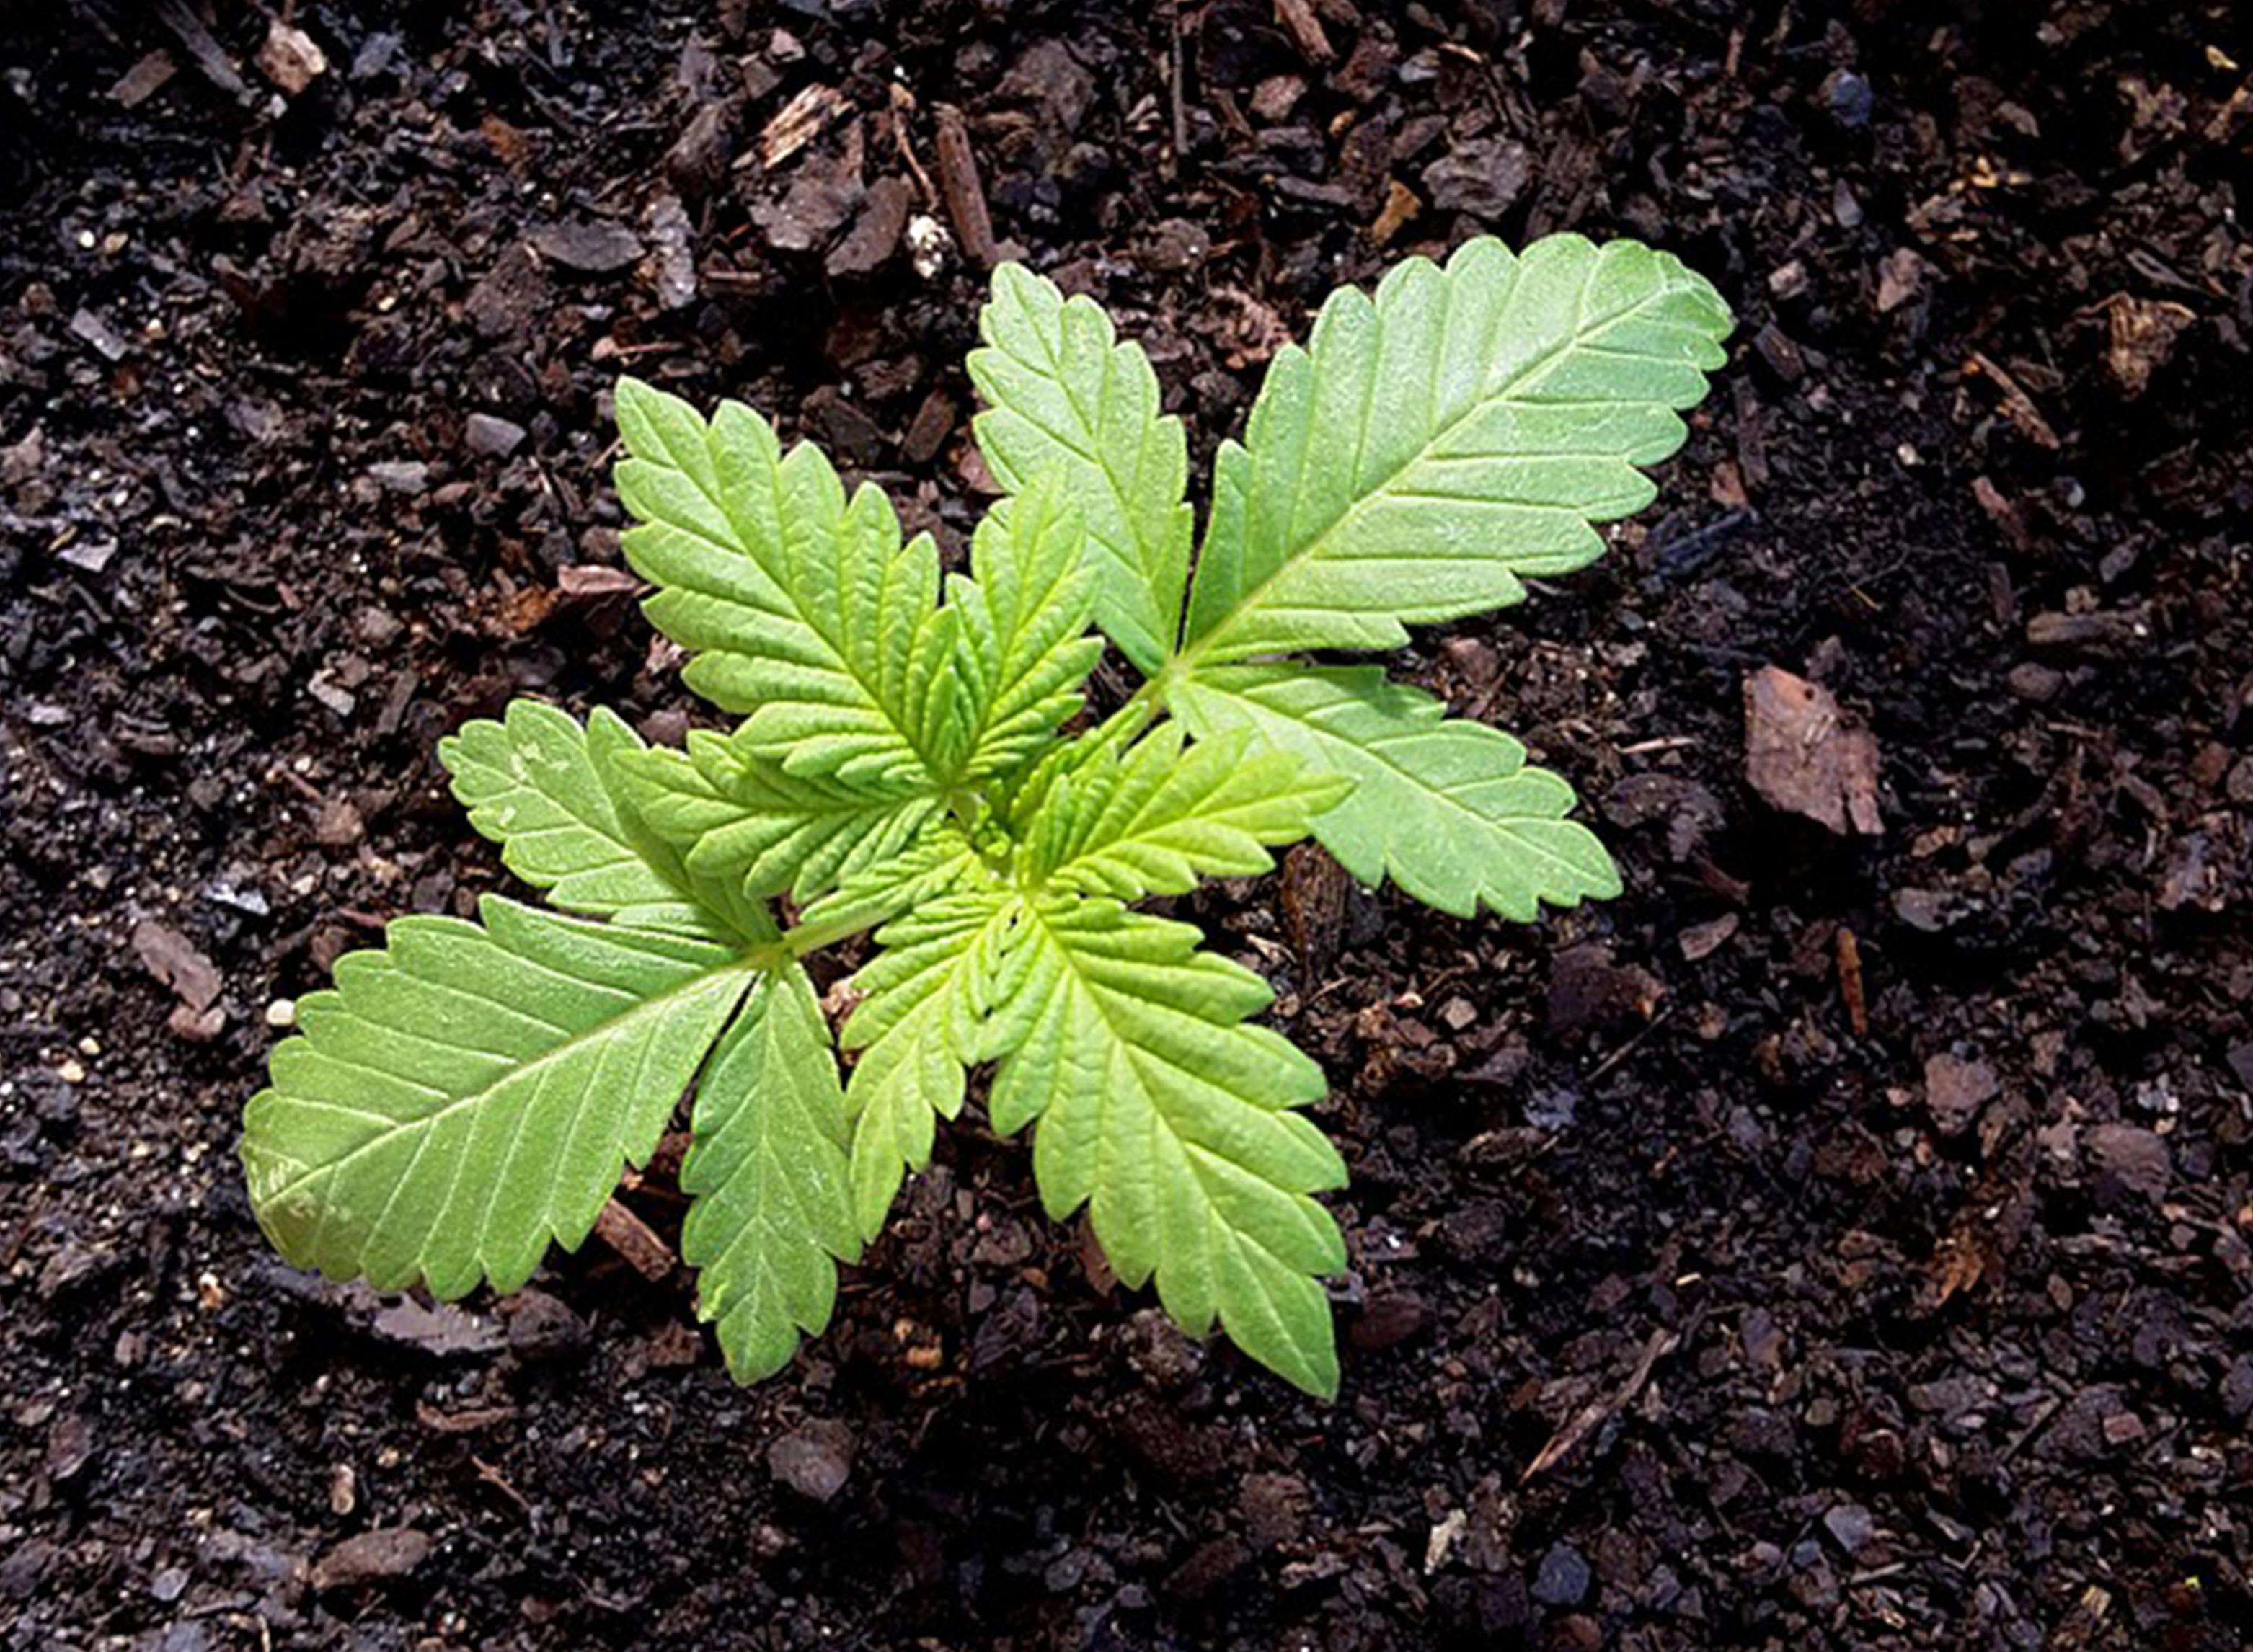 grow cannabis hands-off